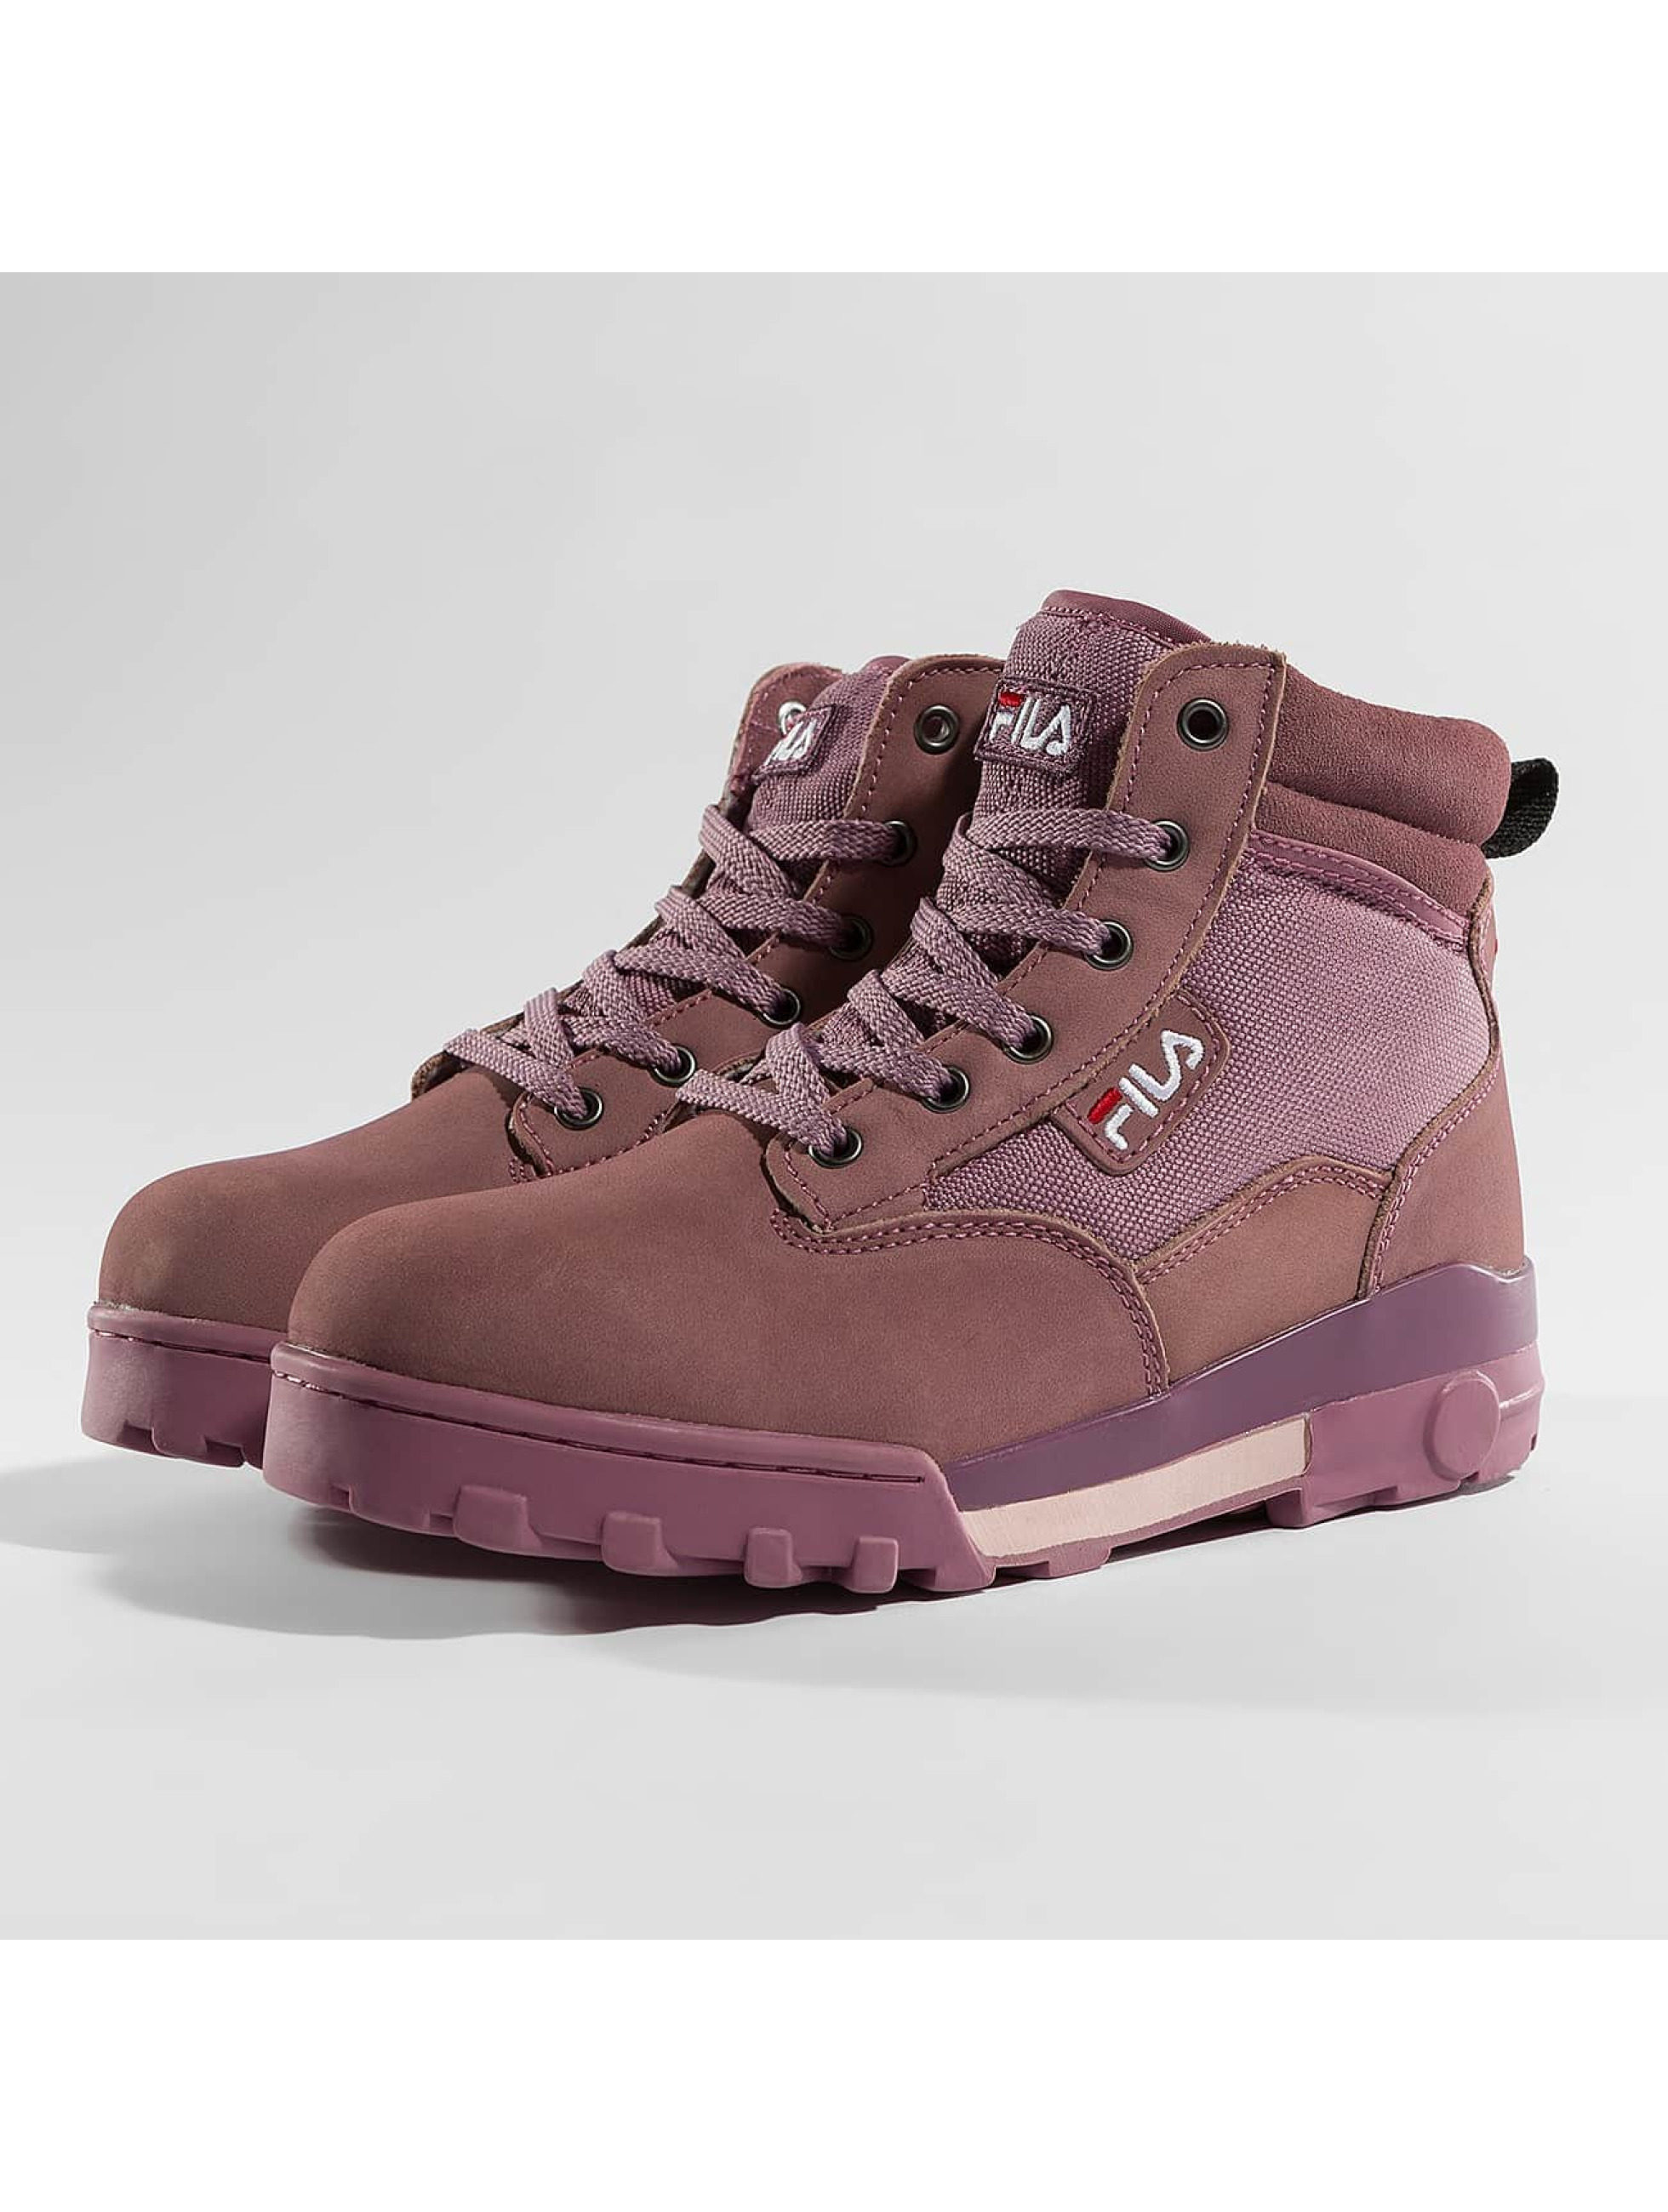 FILA Frauen Boots Heritage Grunge Mid in violet